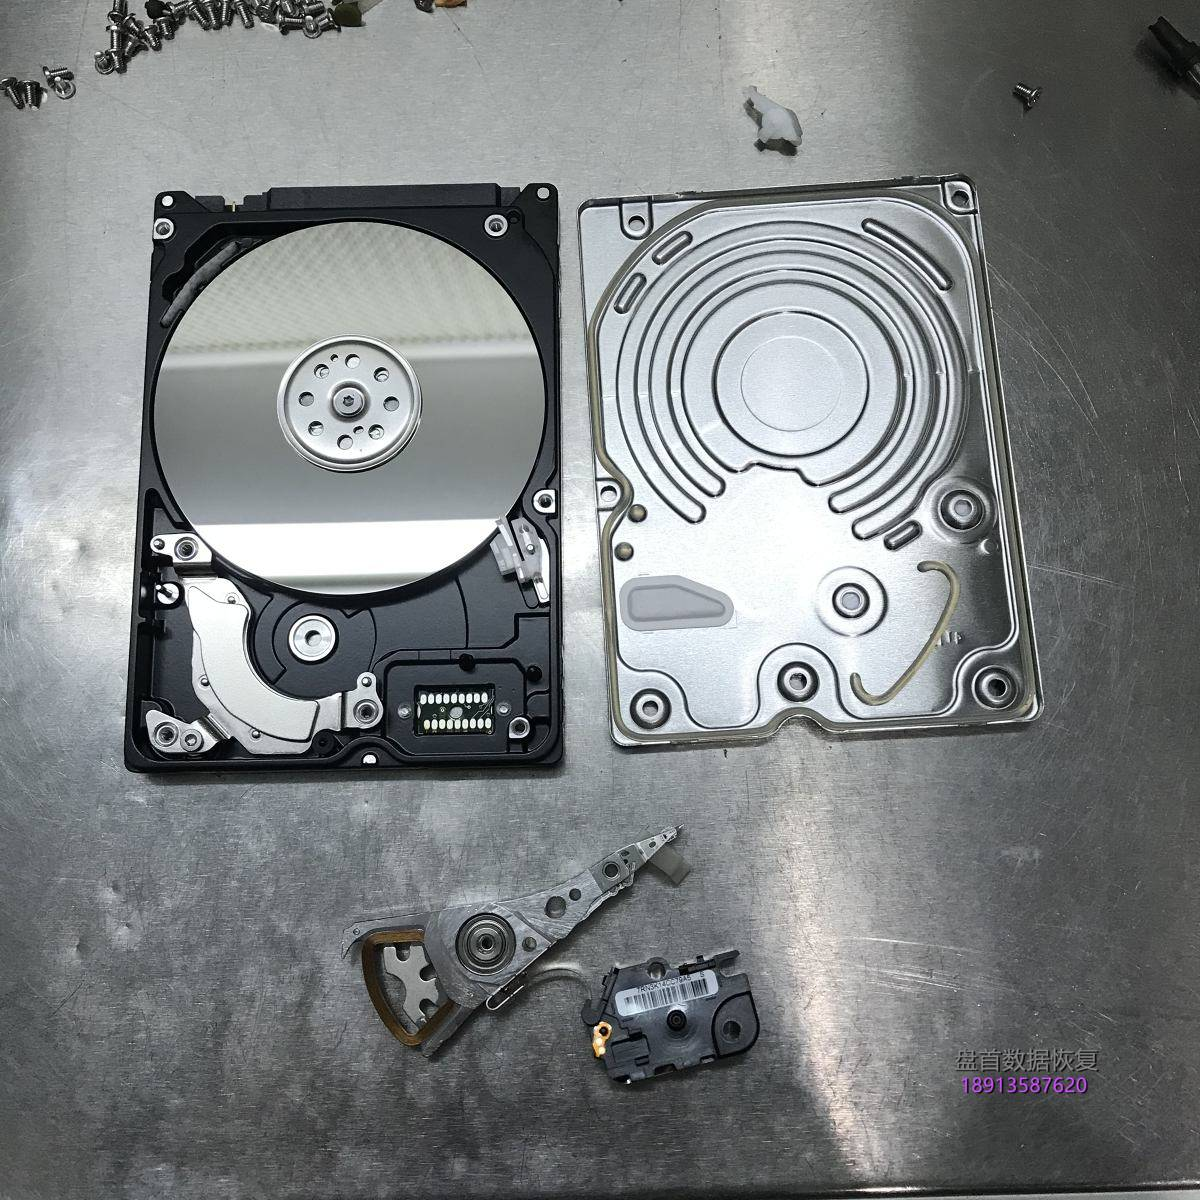 WD10JPVX-08JC3T5笔记本硬盘摔坏导致磁头损坏咔咔响开盘恢复成功